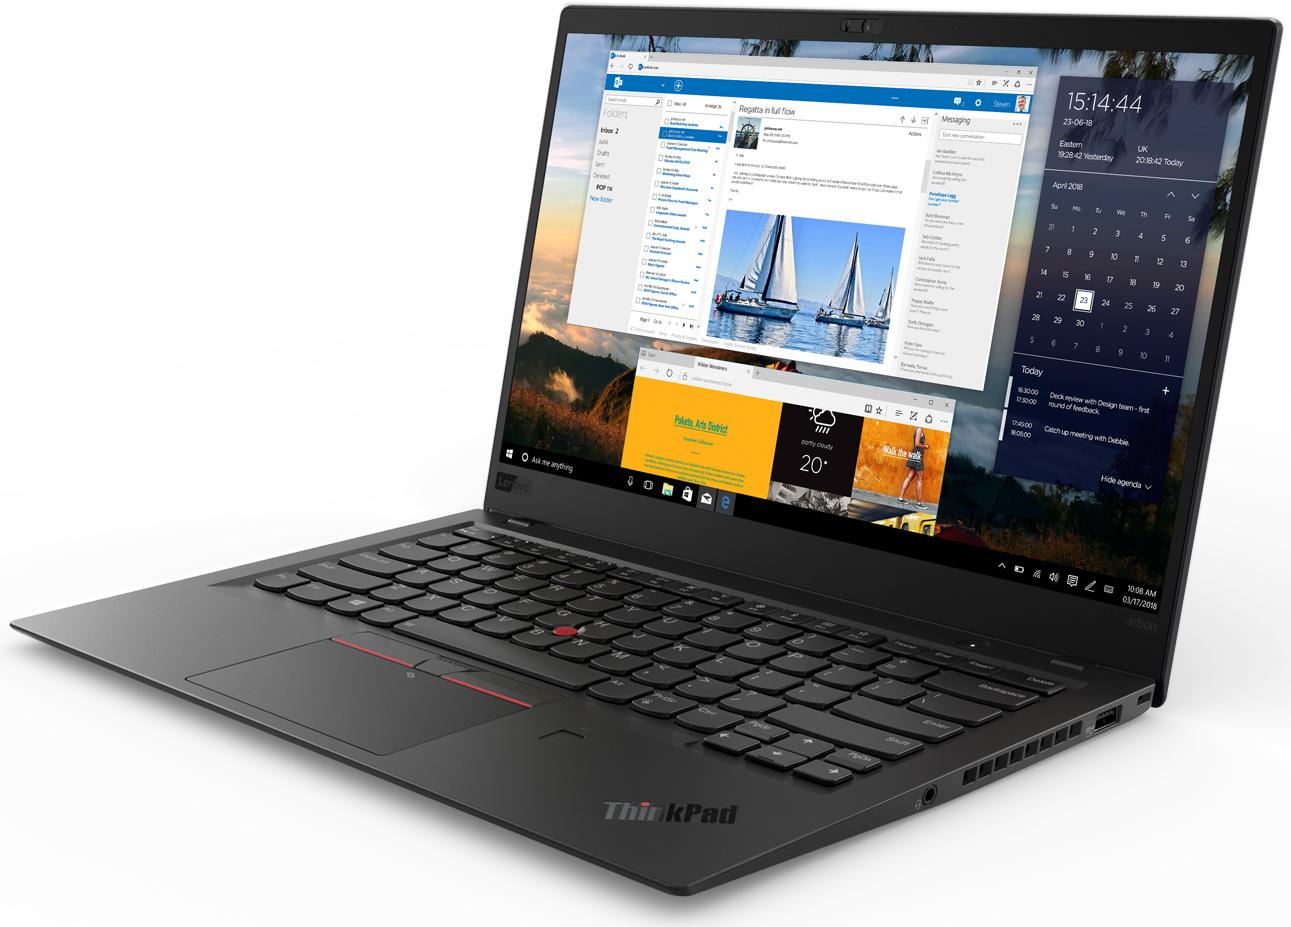 Lenovo Unveils New ThinkPad X1 Carbon, X1 Yoga Laptops: 8th Gen Core